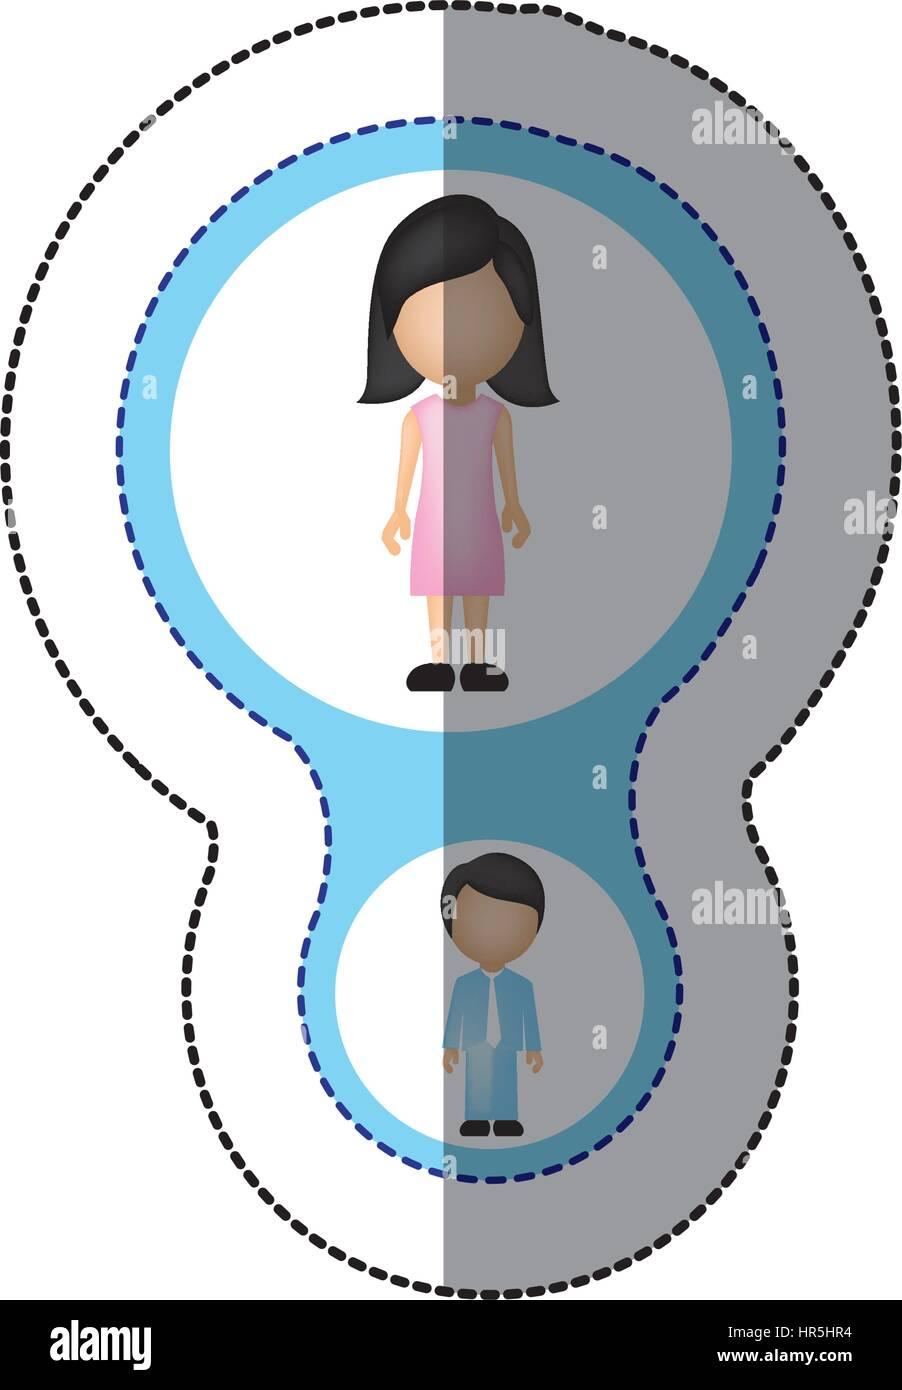 Mom Baby Logo Vector Stockfotos & Mom Baby Logo Vector Bilder - Alamy